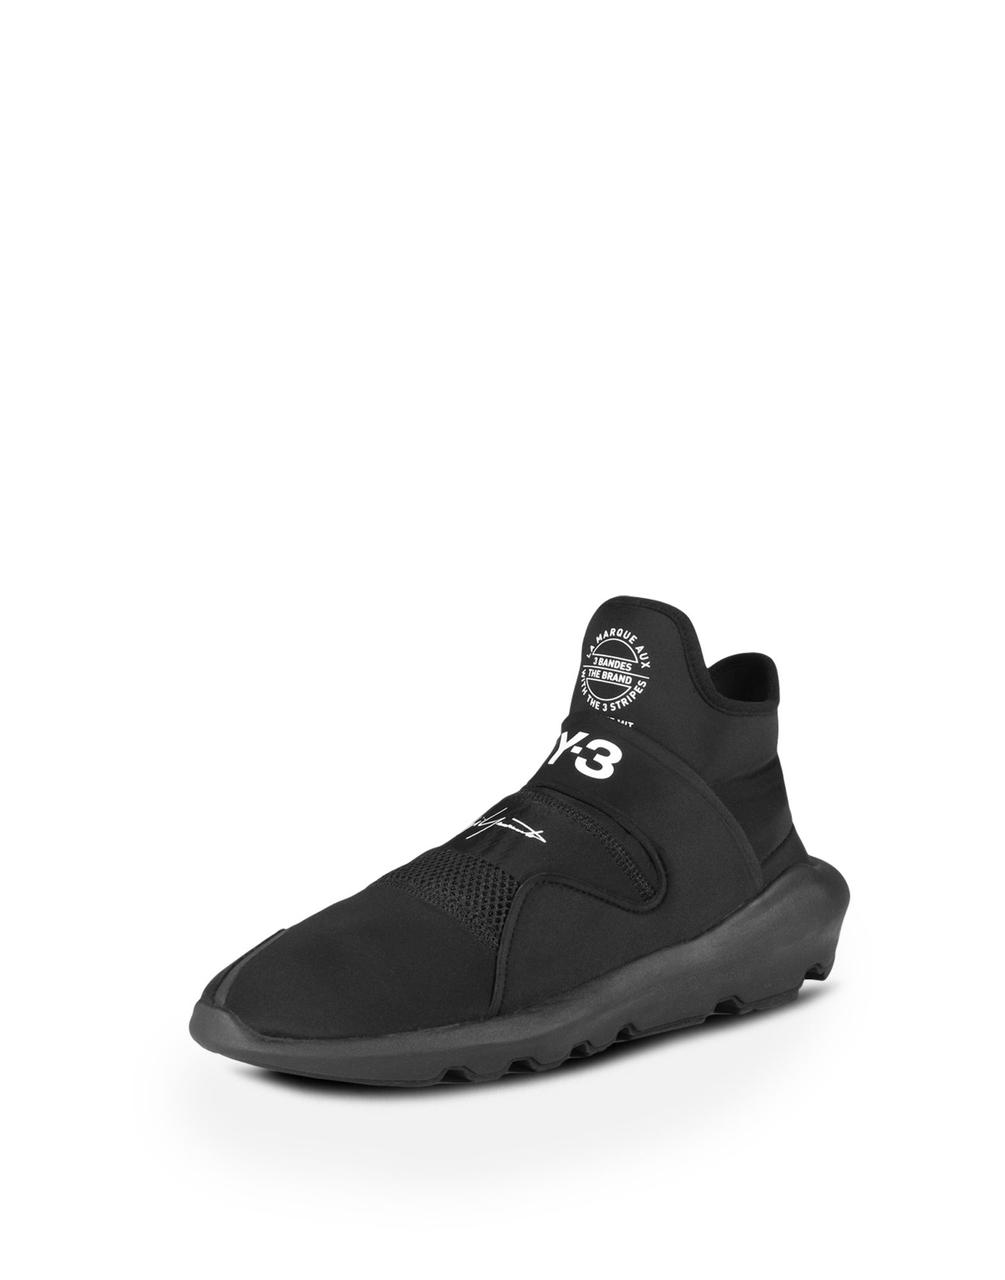 Женские кроссовки Adidas YAMAMOTO Y-3 SUBEROU All Black